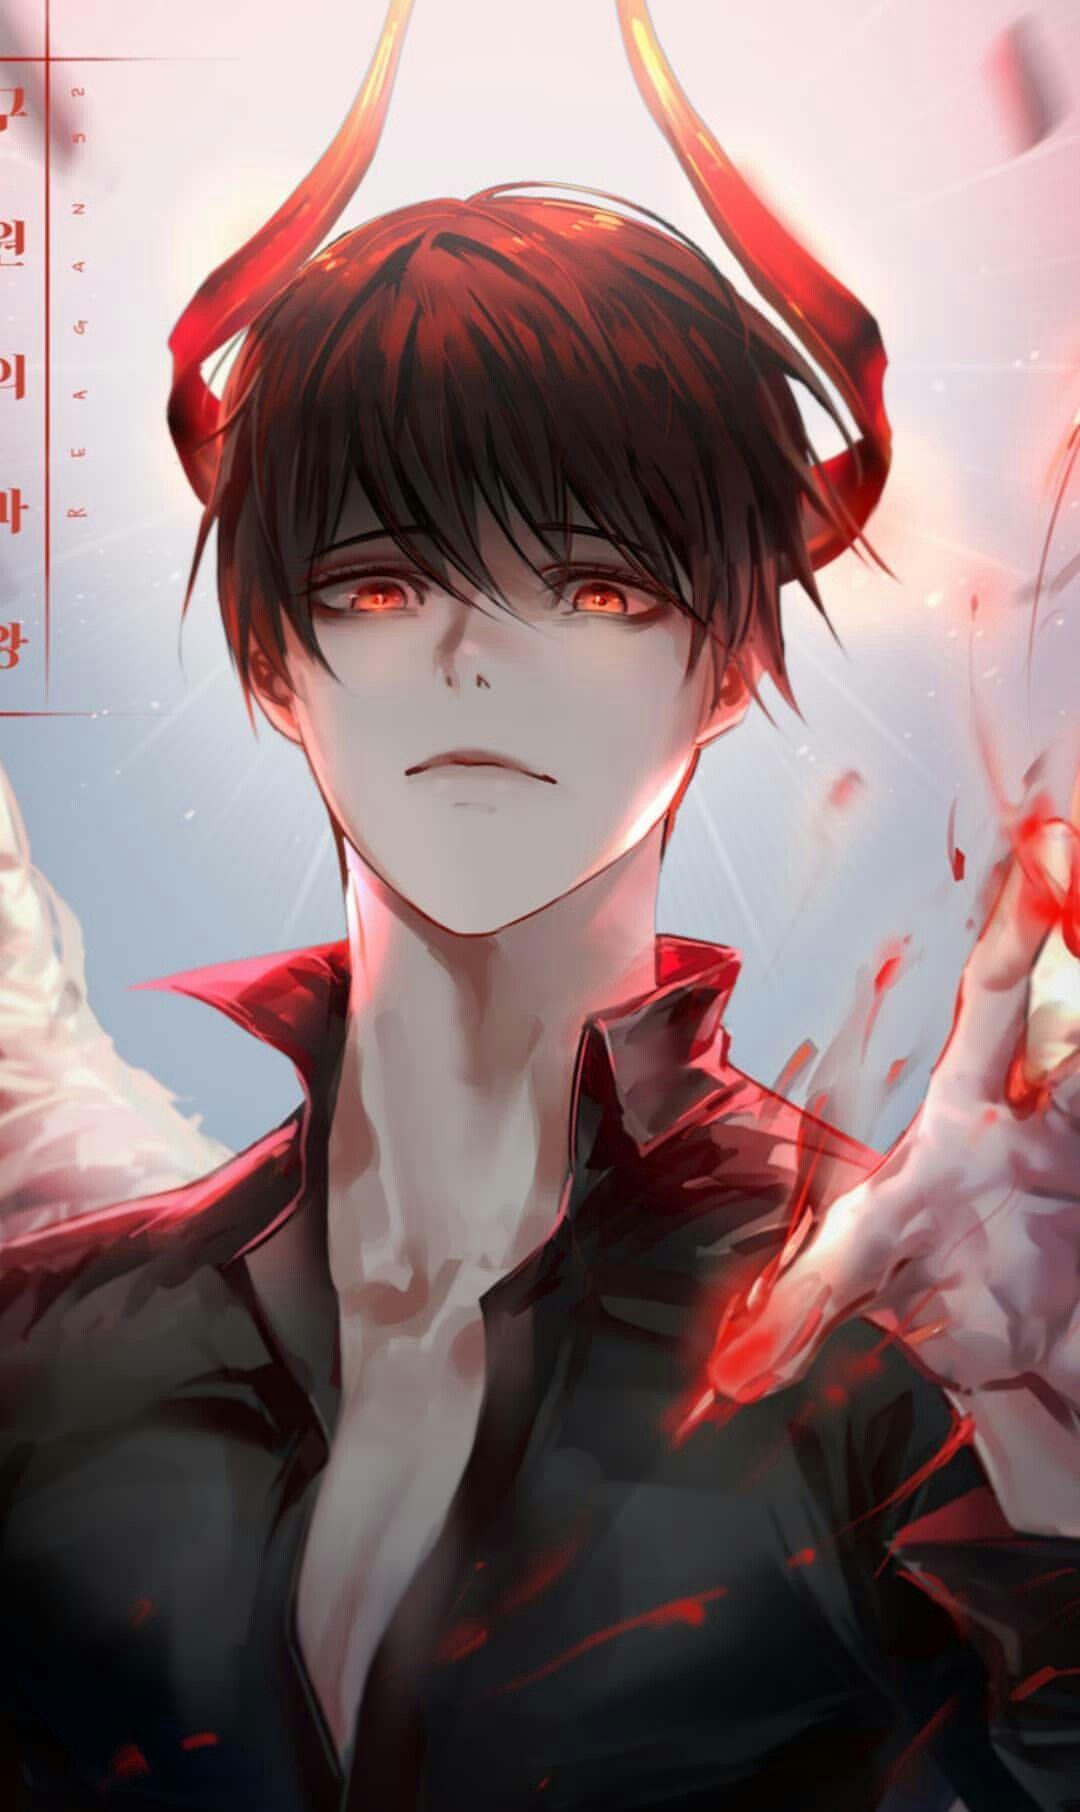 bst hinh nen anime nam dep nhat cho dien thoai 17